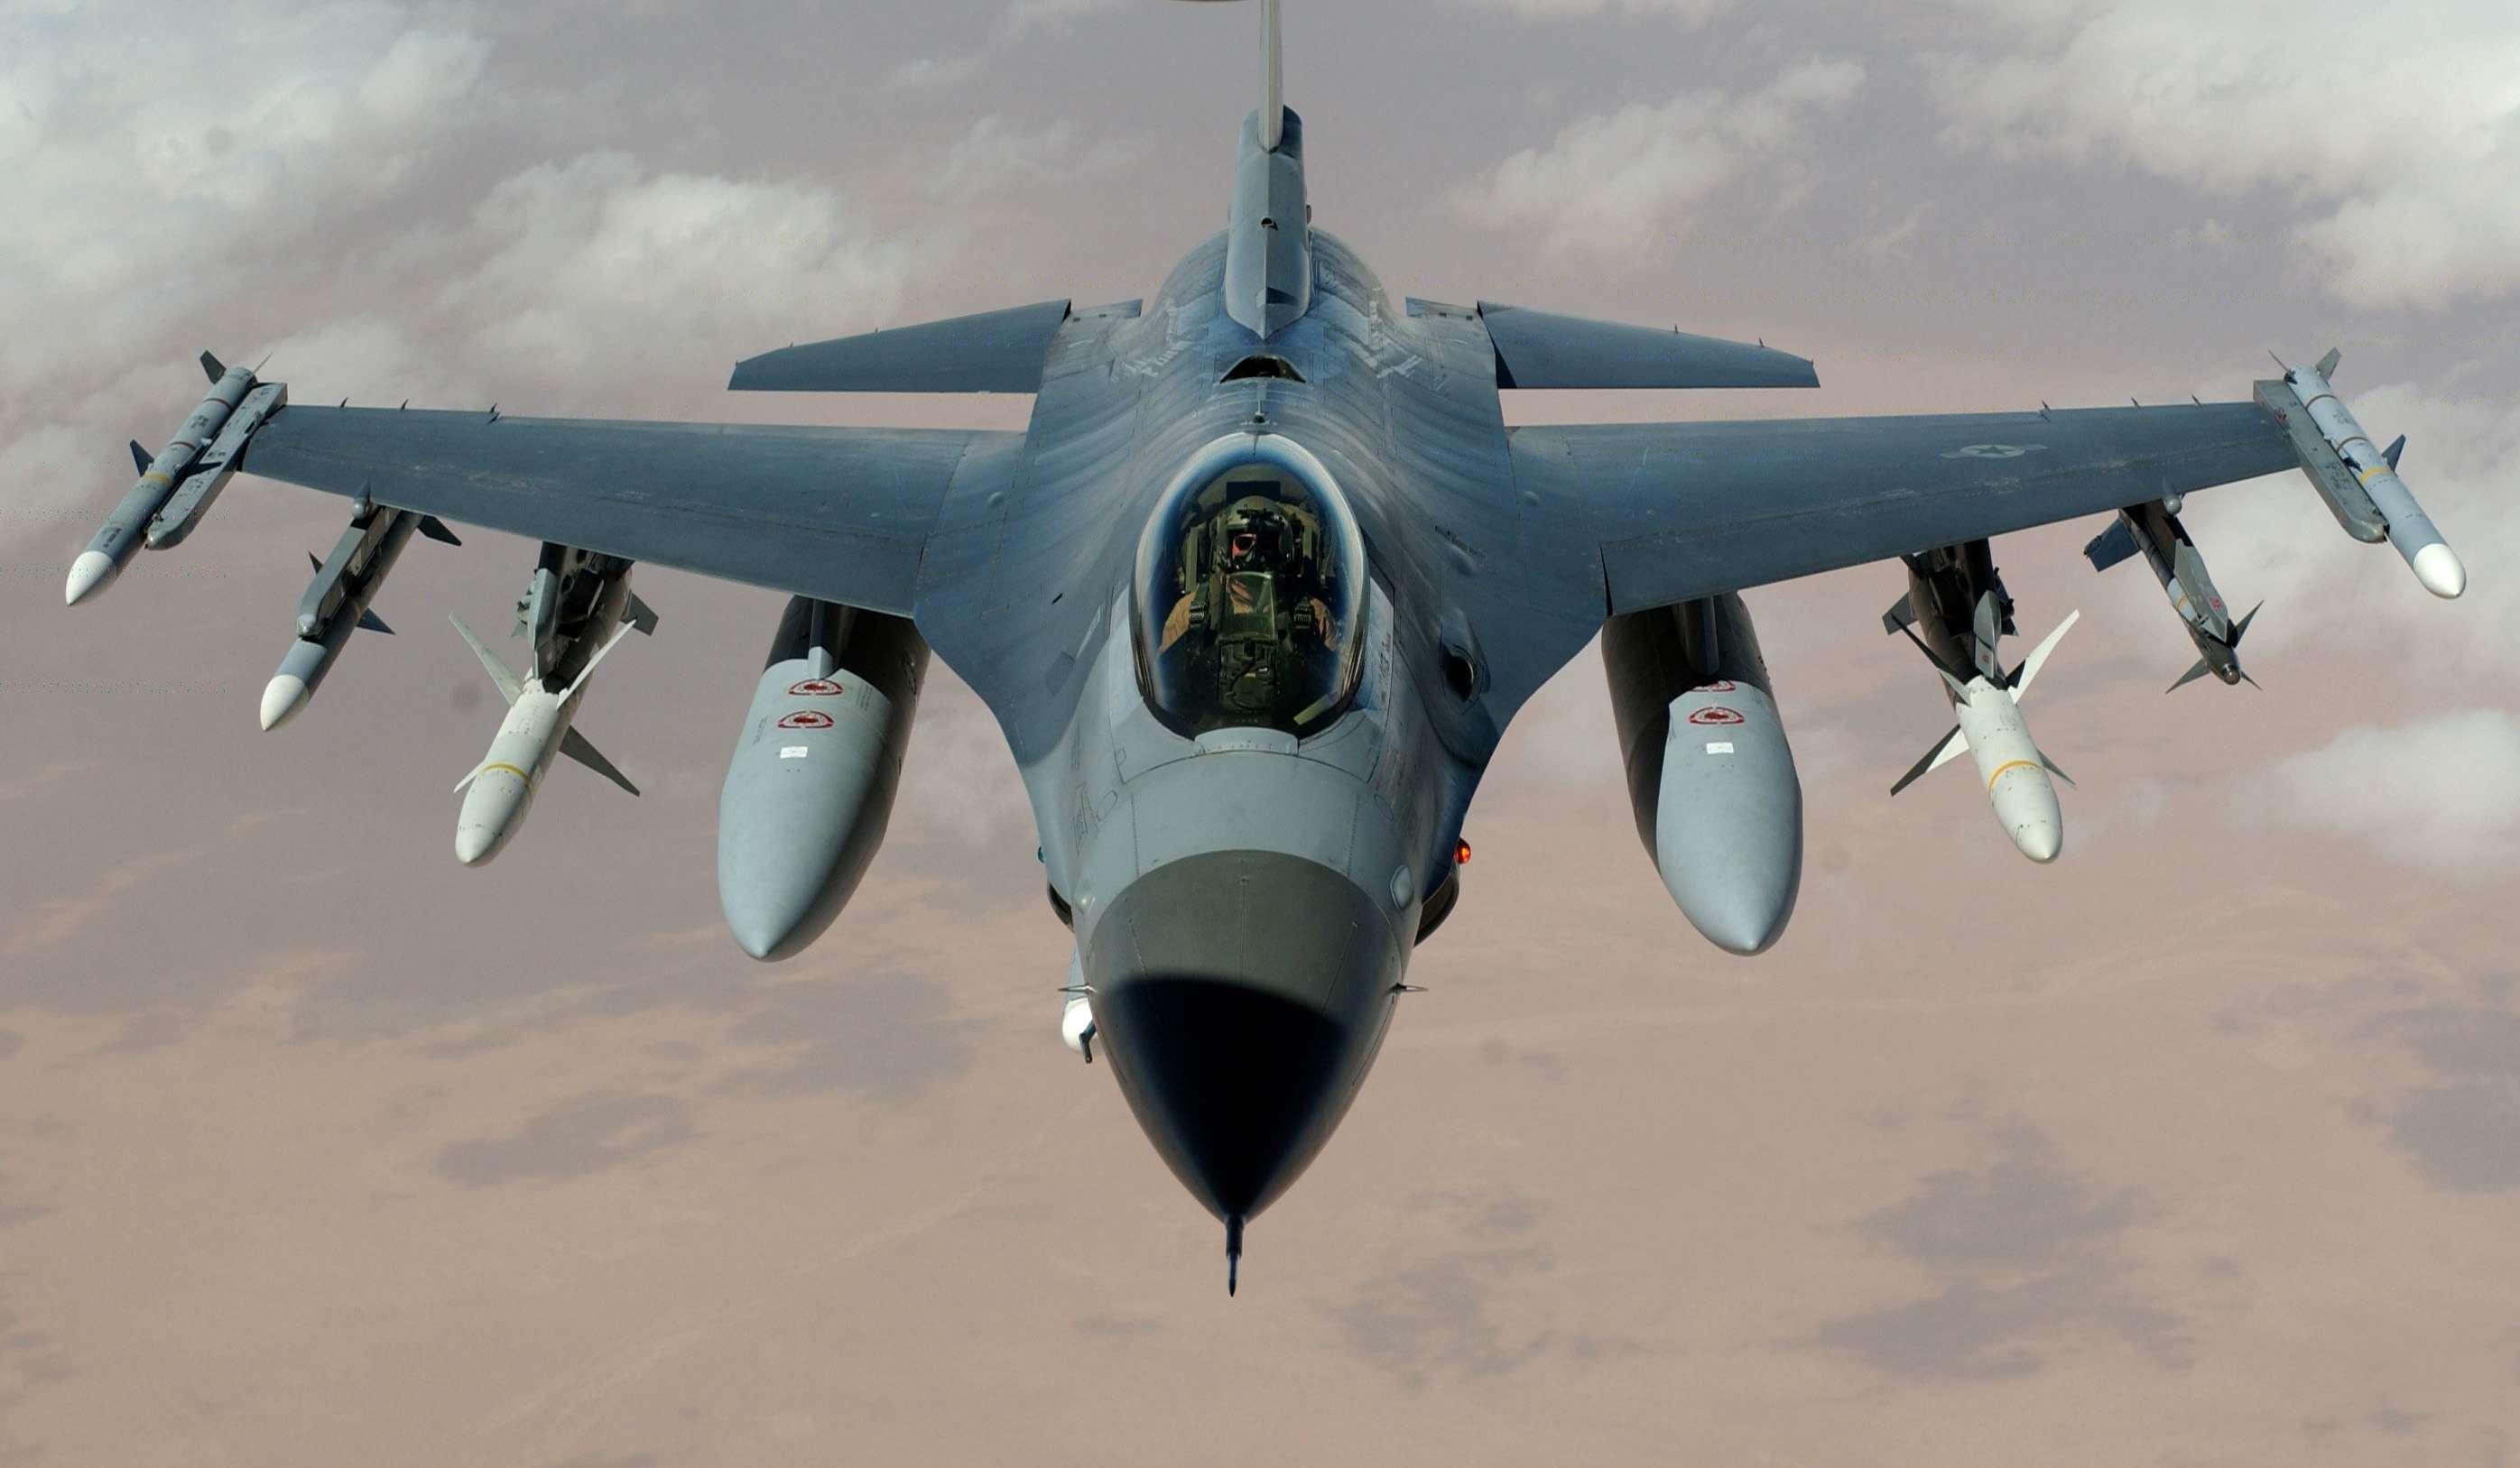 F 16. Τα αεροπλάνα θα αρχίσουν να κατασκευάζονται σε βιομηχανική κλίμακα για την πολεμική αεροπορία του Α΄ Παγκοσμίου Πολέμου.